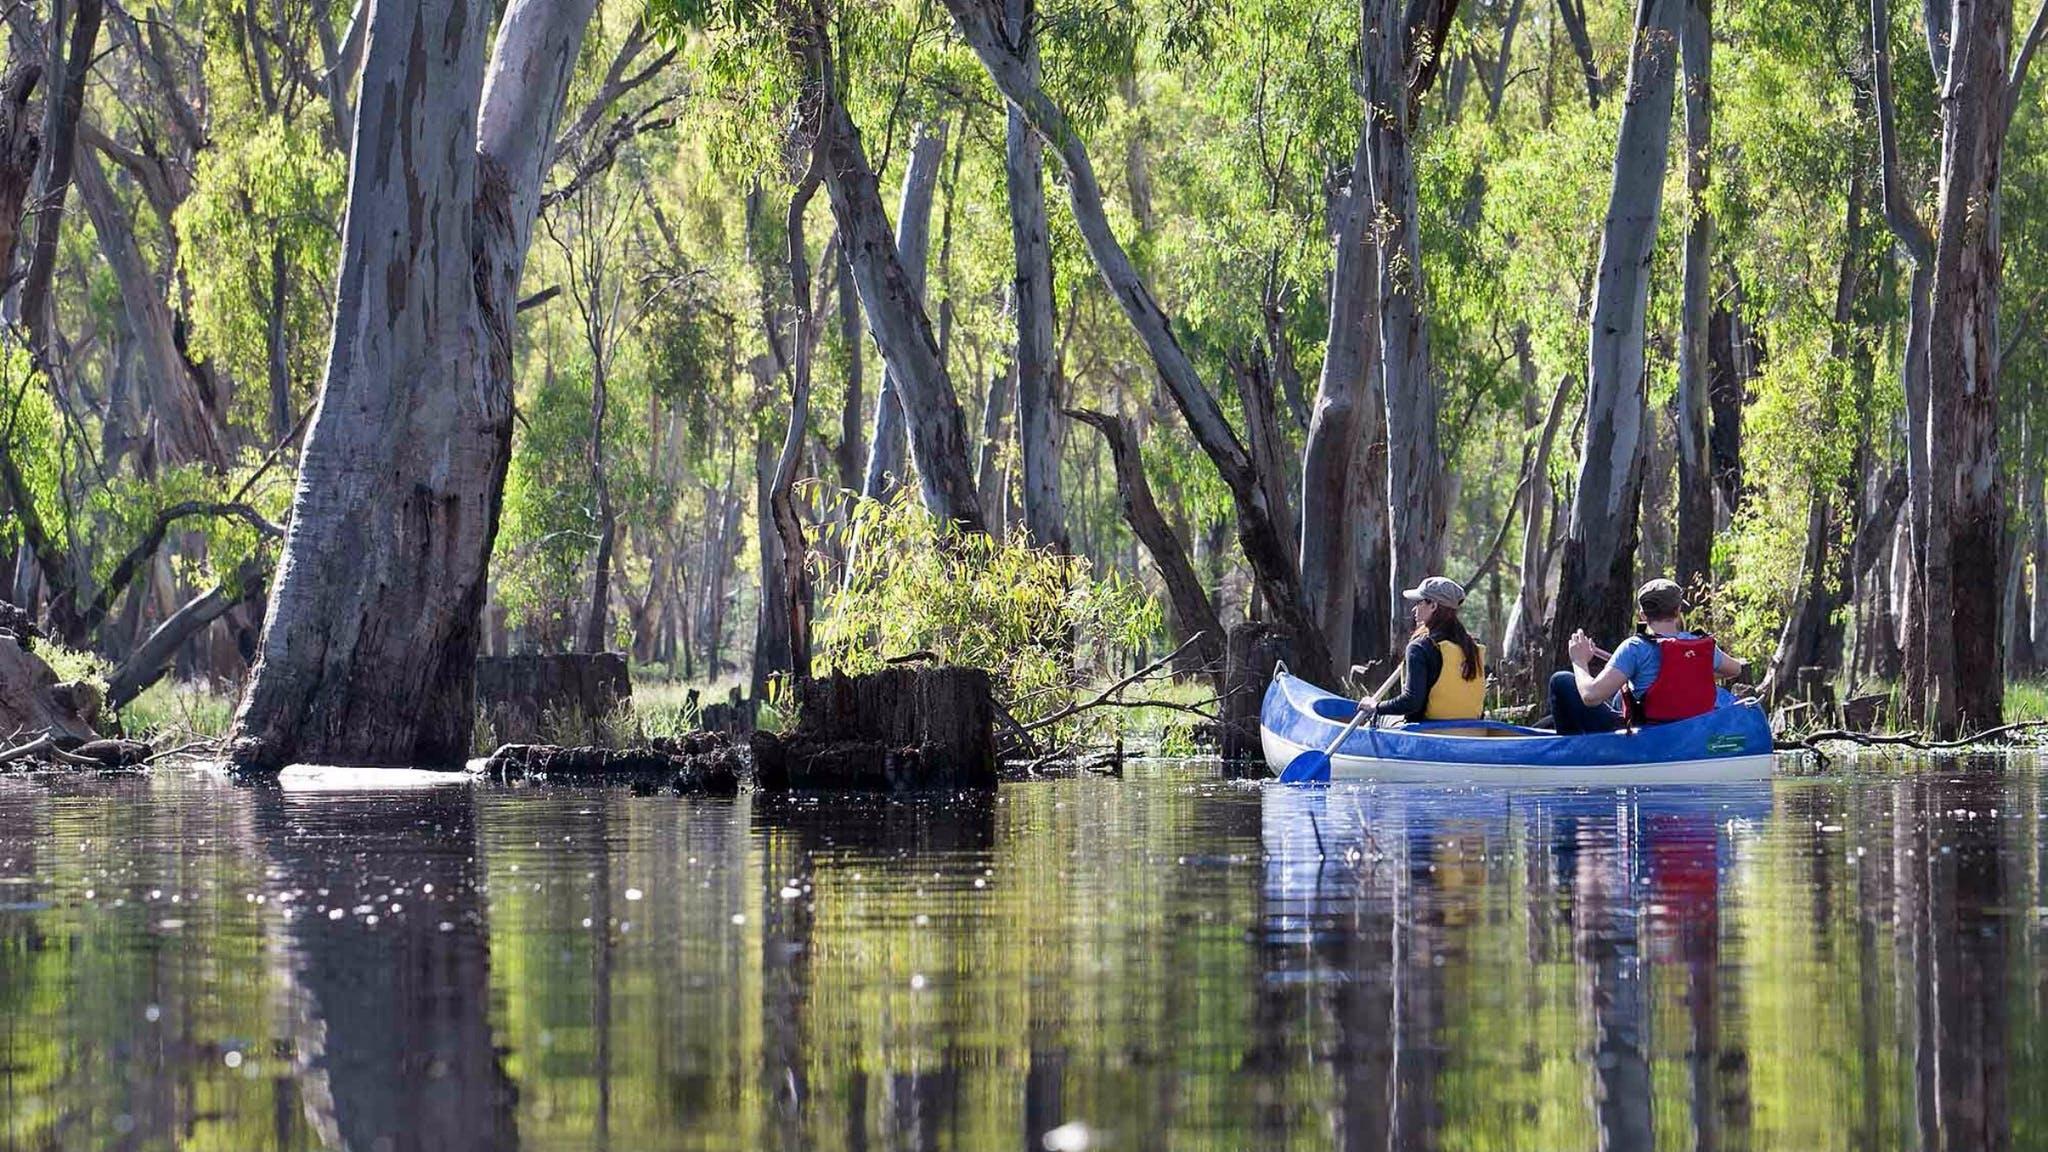 Edward River canoe and kayak trail